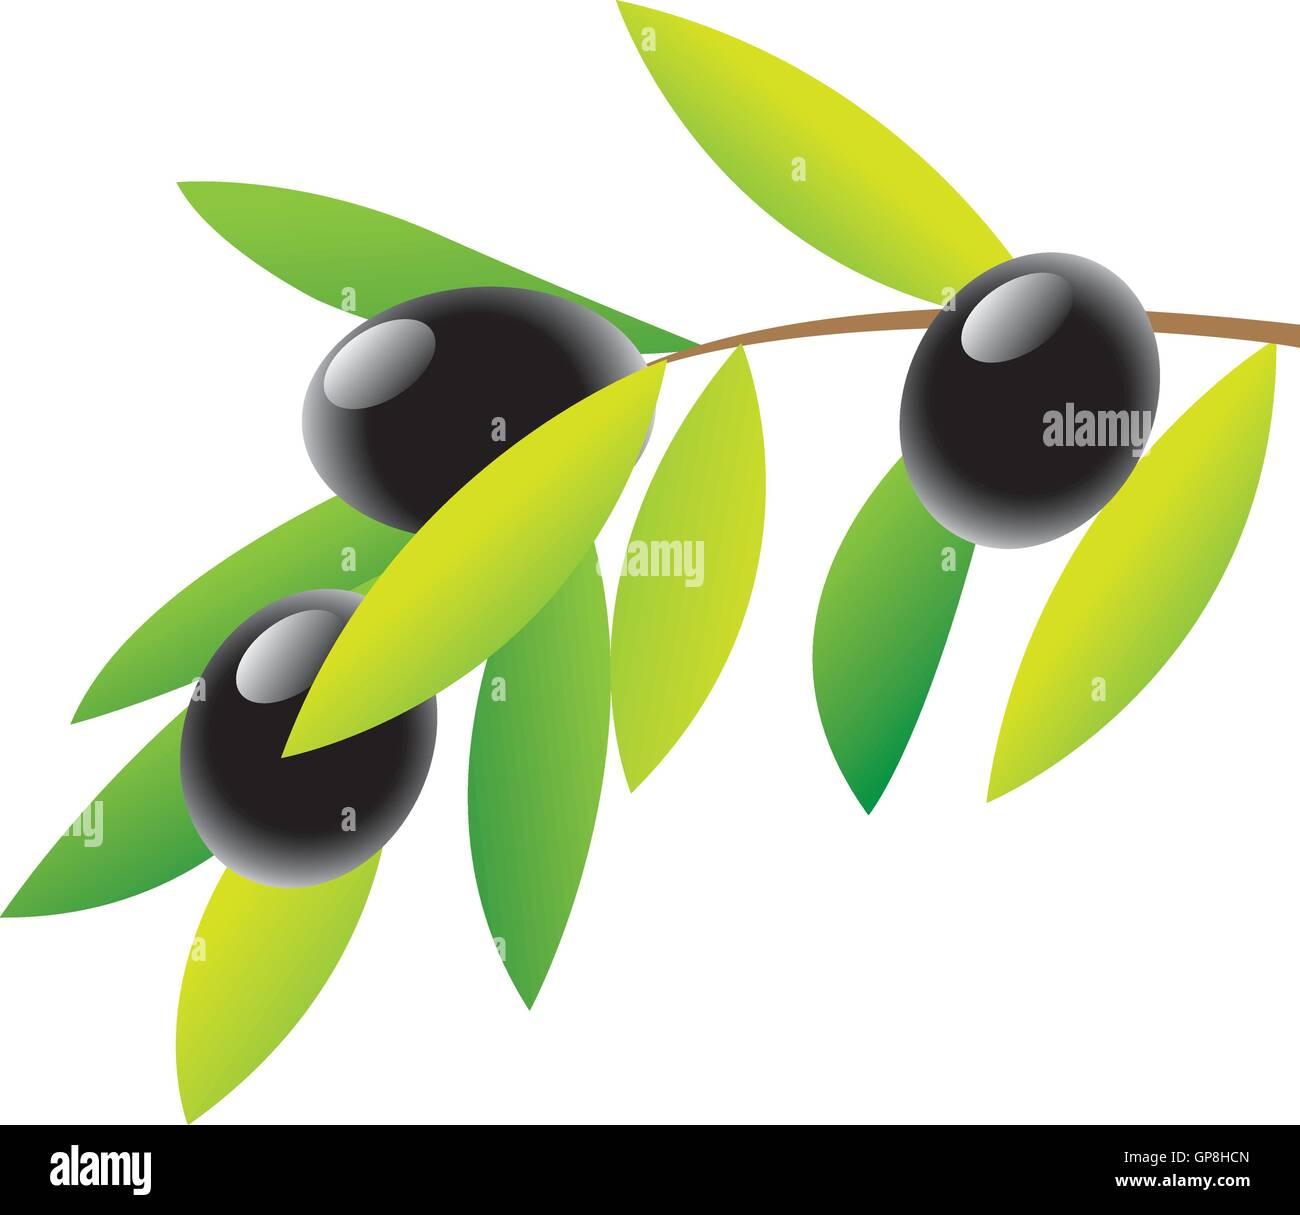 Black Olives Vector Vectors Stock Photos & Black Olives Vector ...